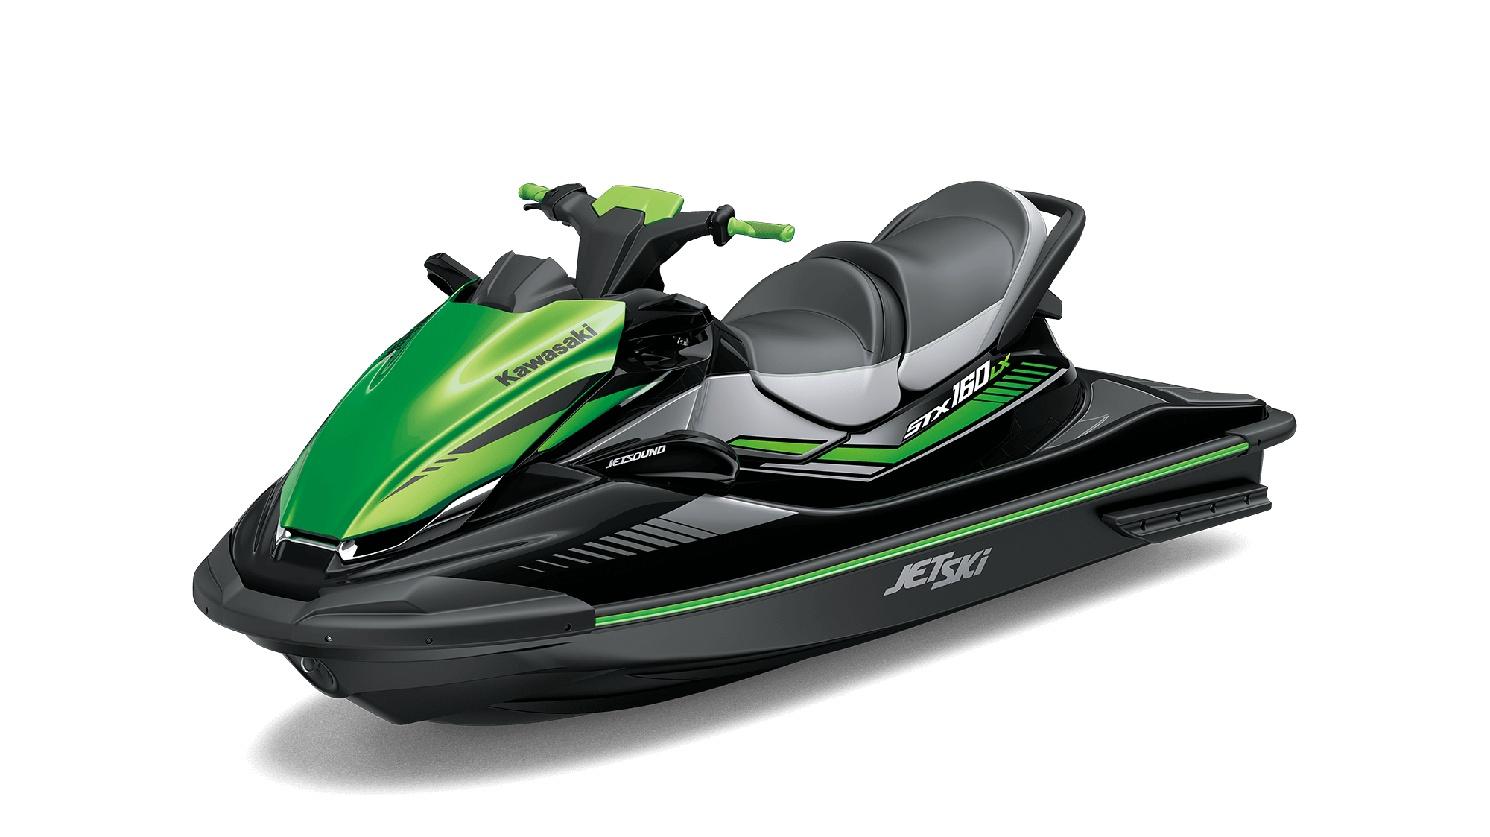 2020 Kawasaki JET SKI STX-160LX Ebony / Candy Lime Green